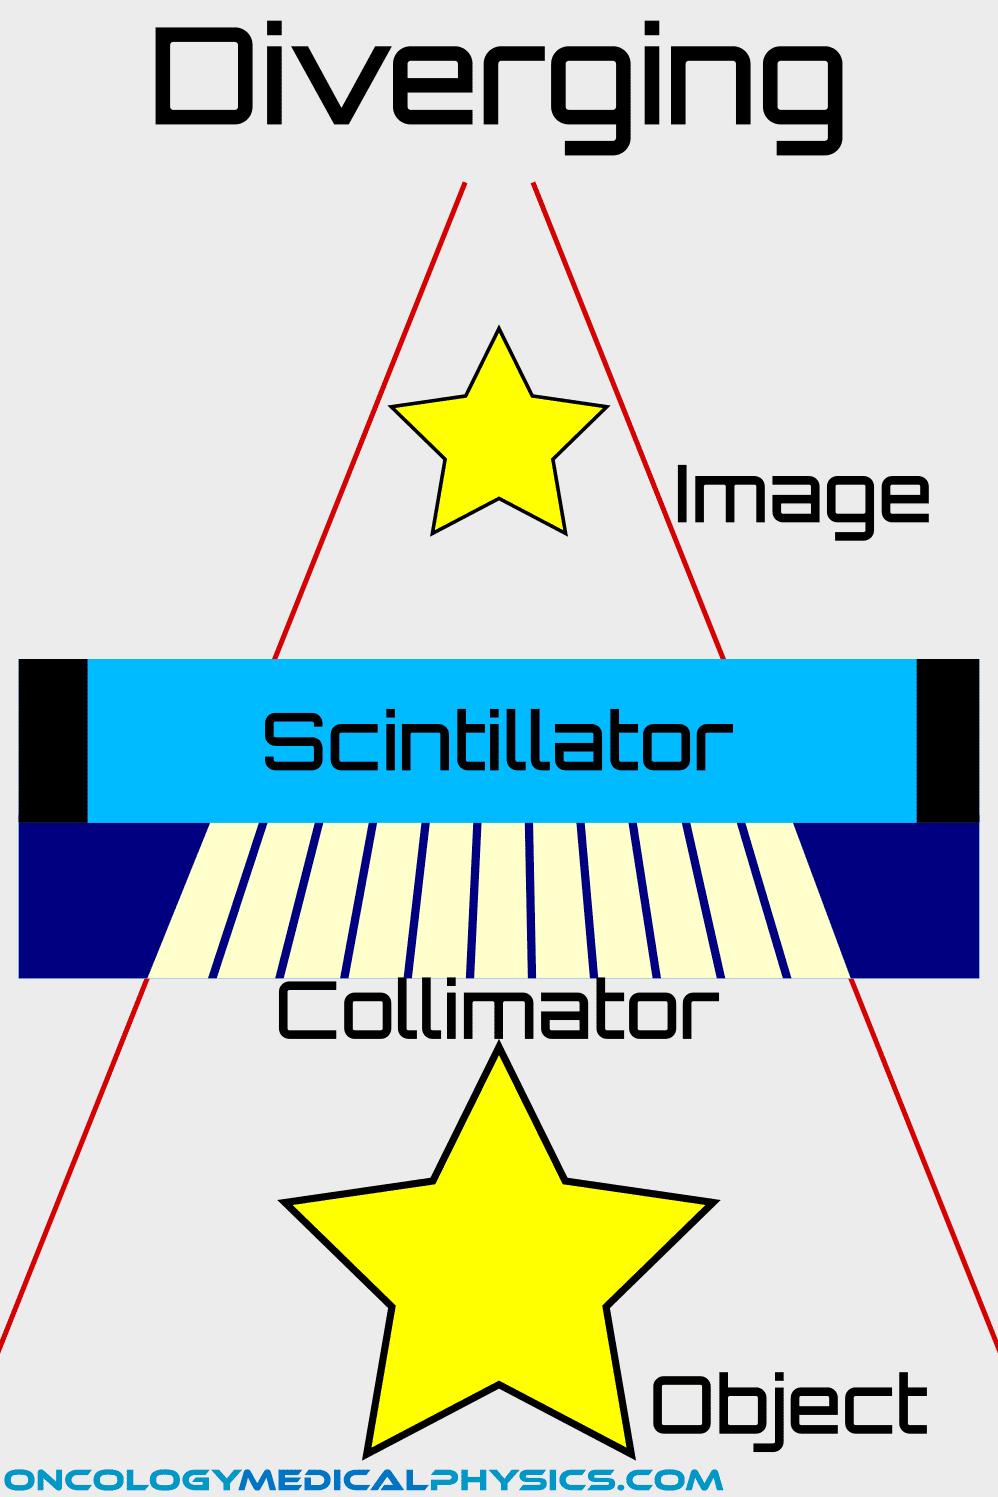 Diverging collimator anger gamma camera